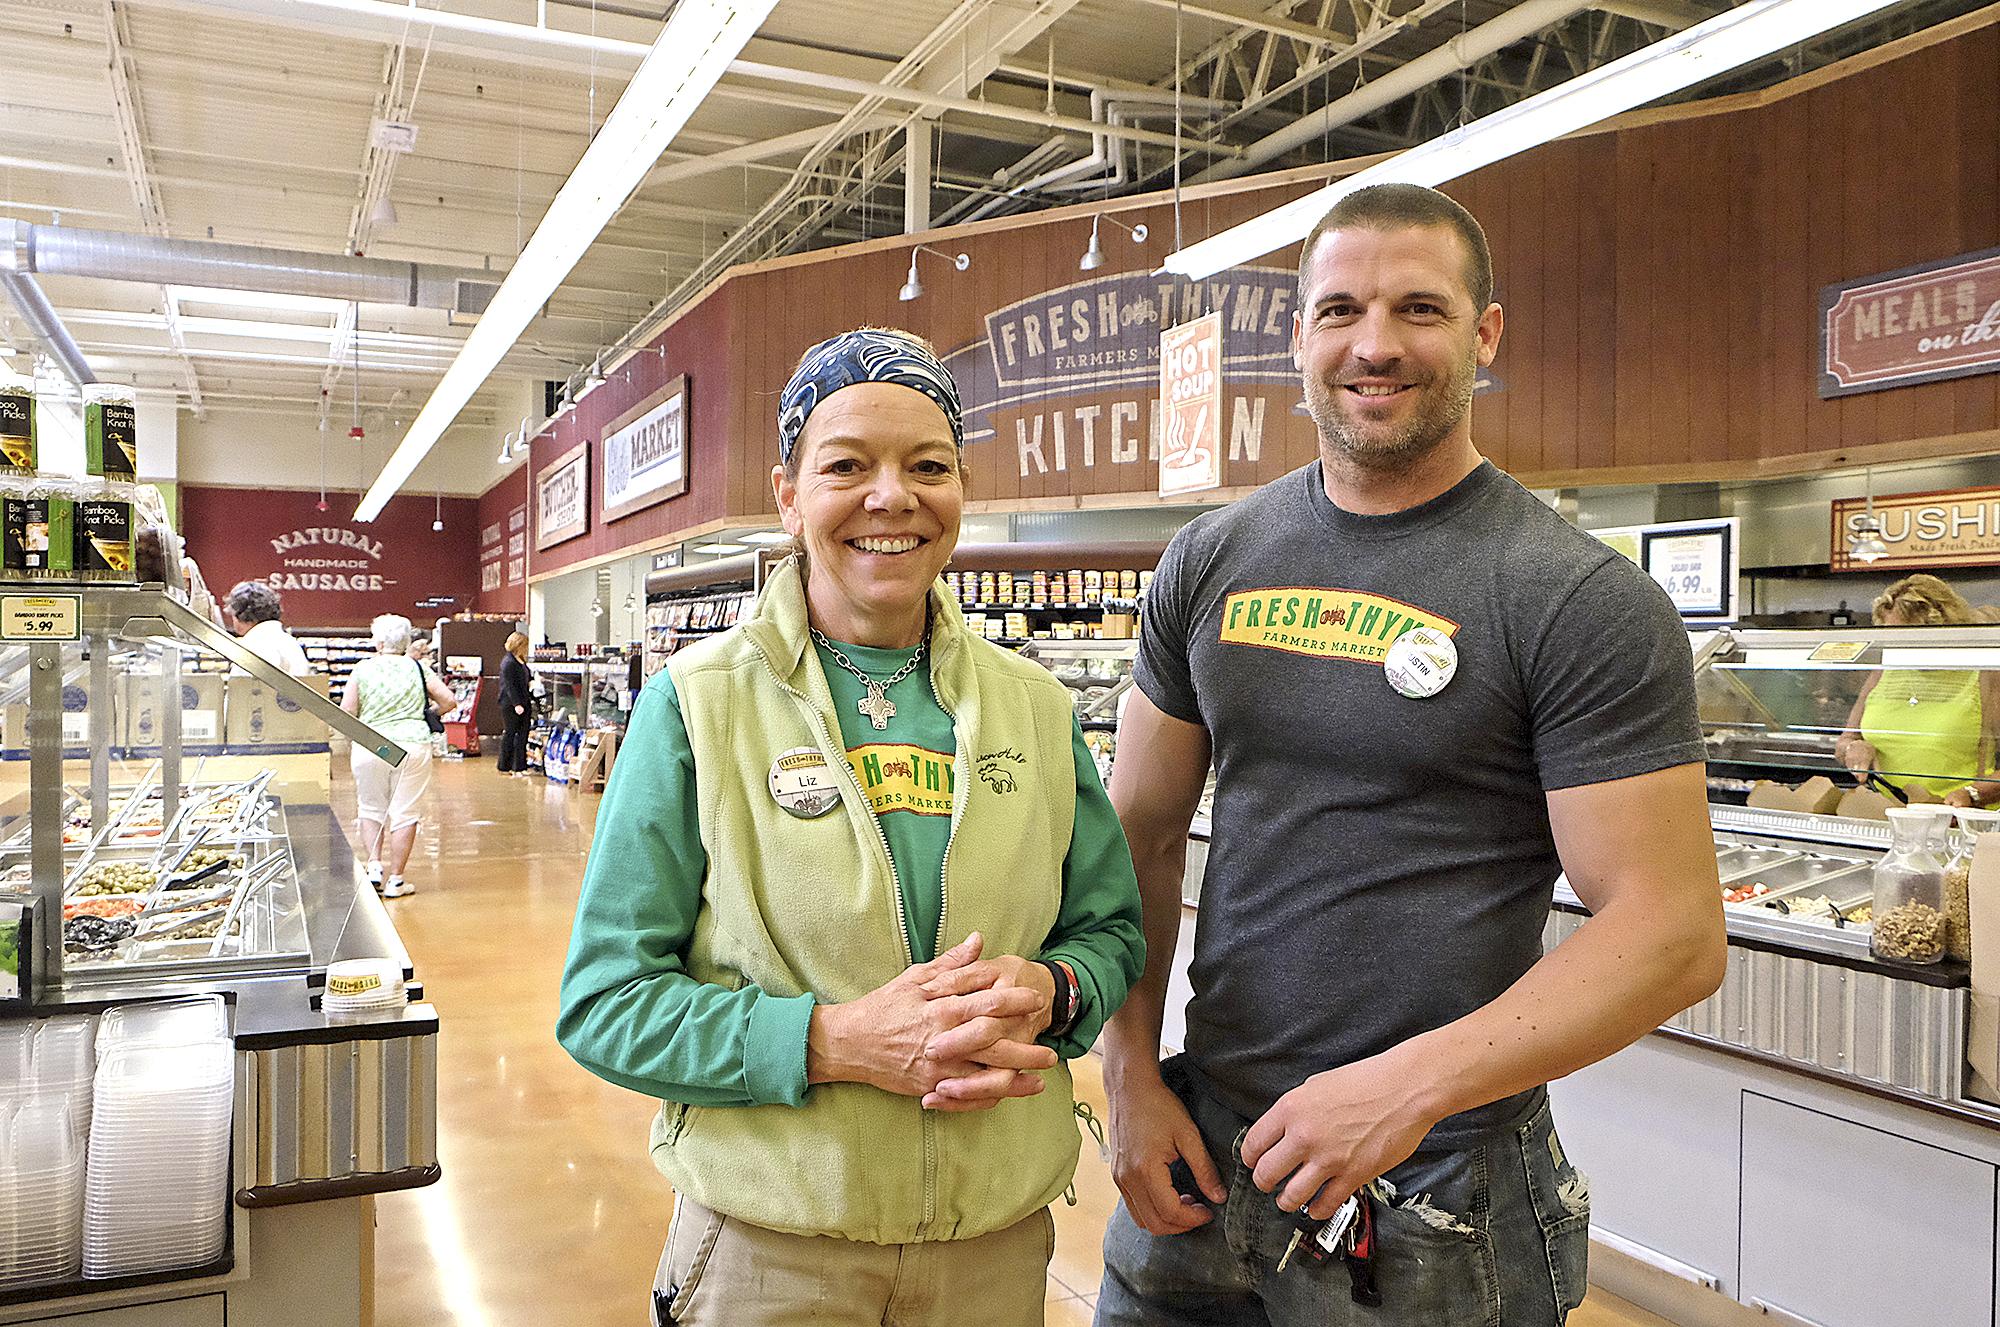 Ohio Farmers Food Service